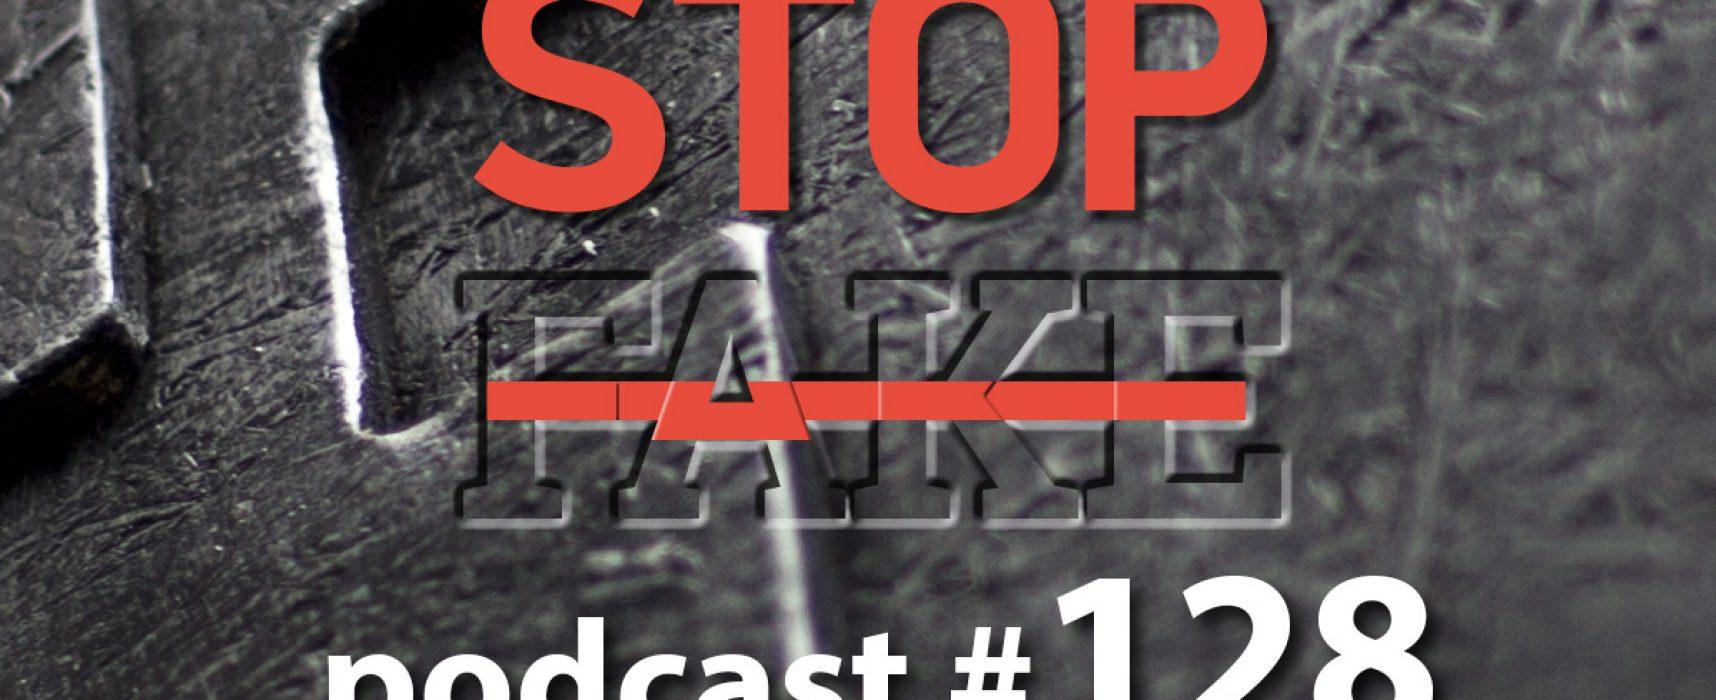 StopFake podcast #128